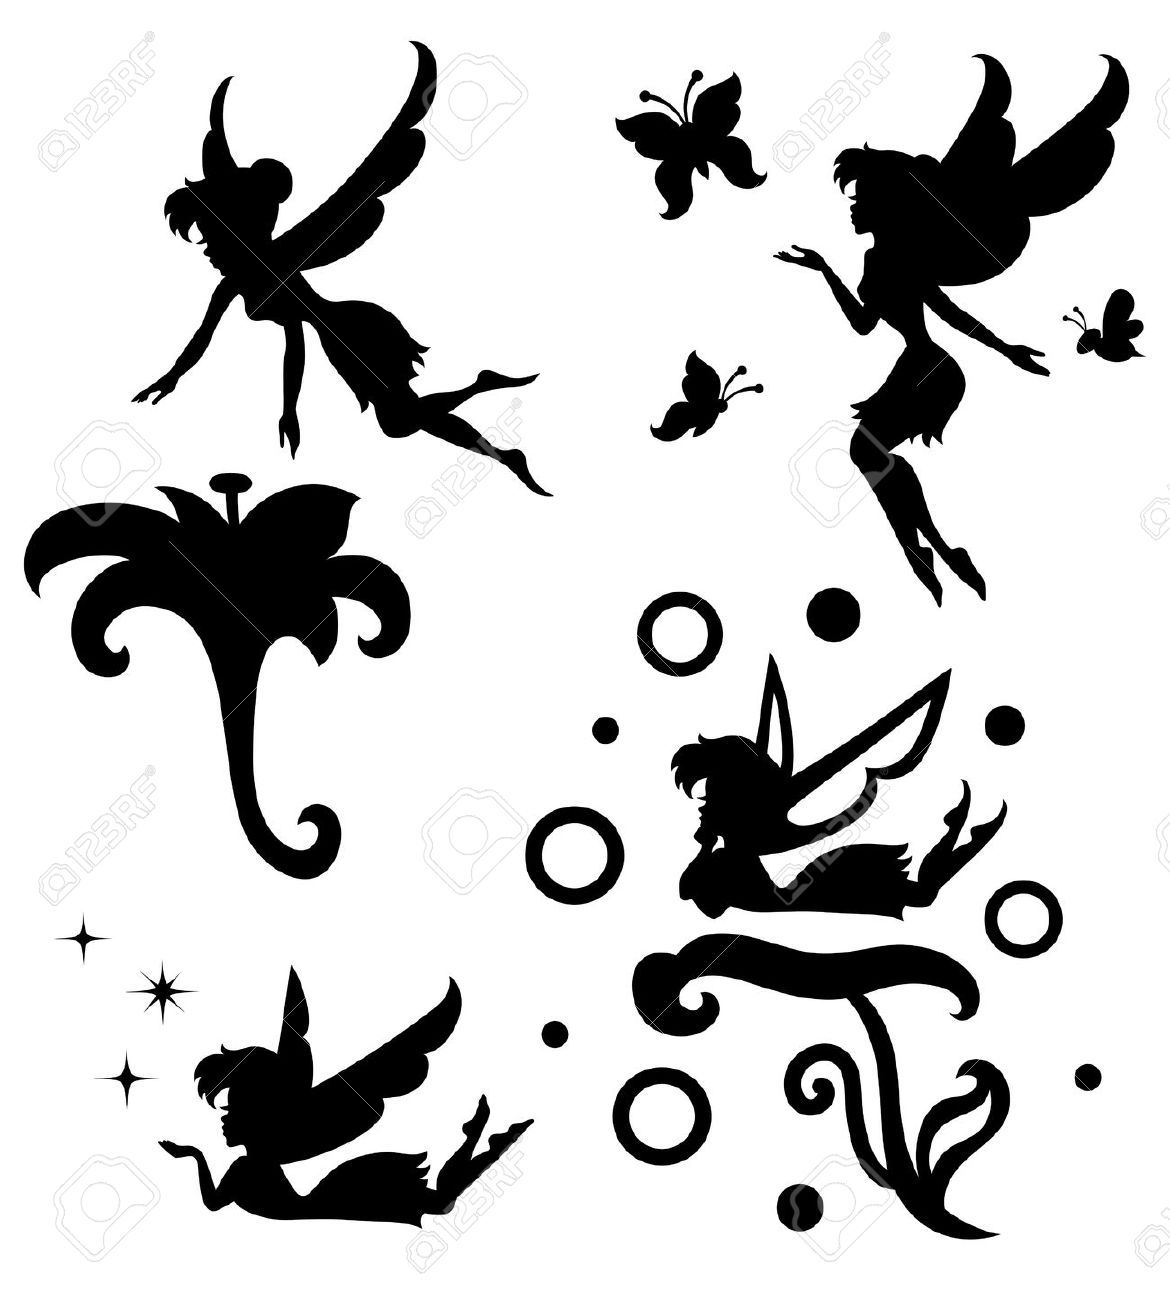 Fairy In Window Silhouette - Google Search